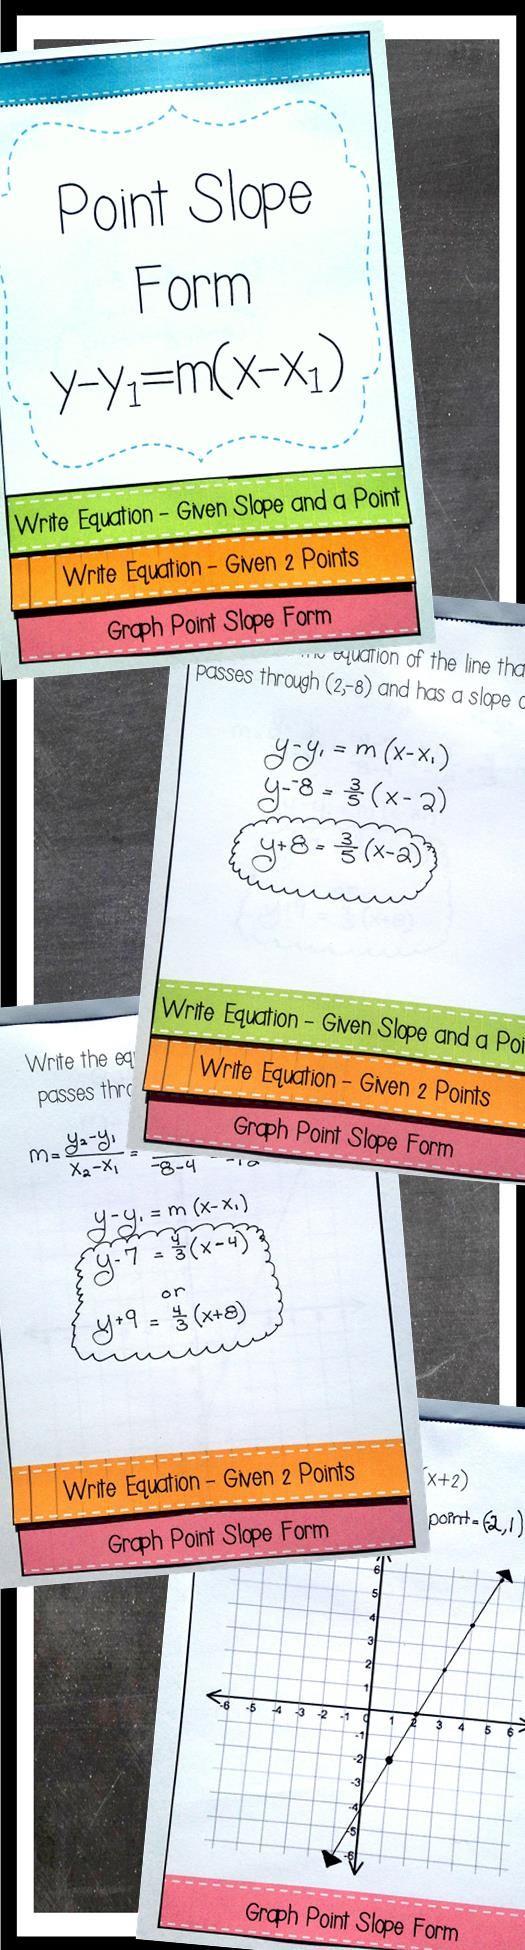 point slope form worksheet doc 1000 ideas about algebra equations on pinterest two distance. Black Bedroom Furniture Sets. Home Design Ideas